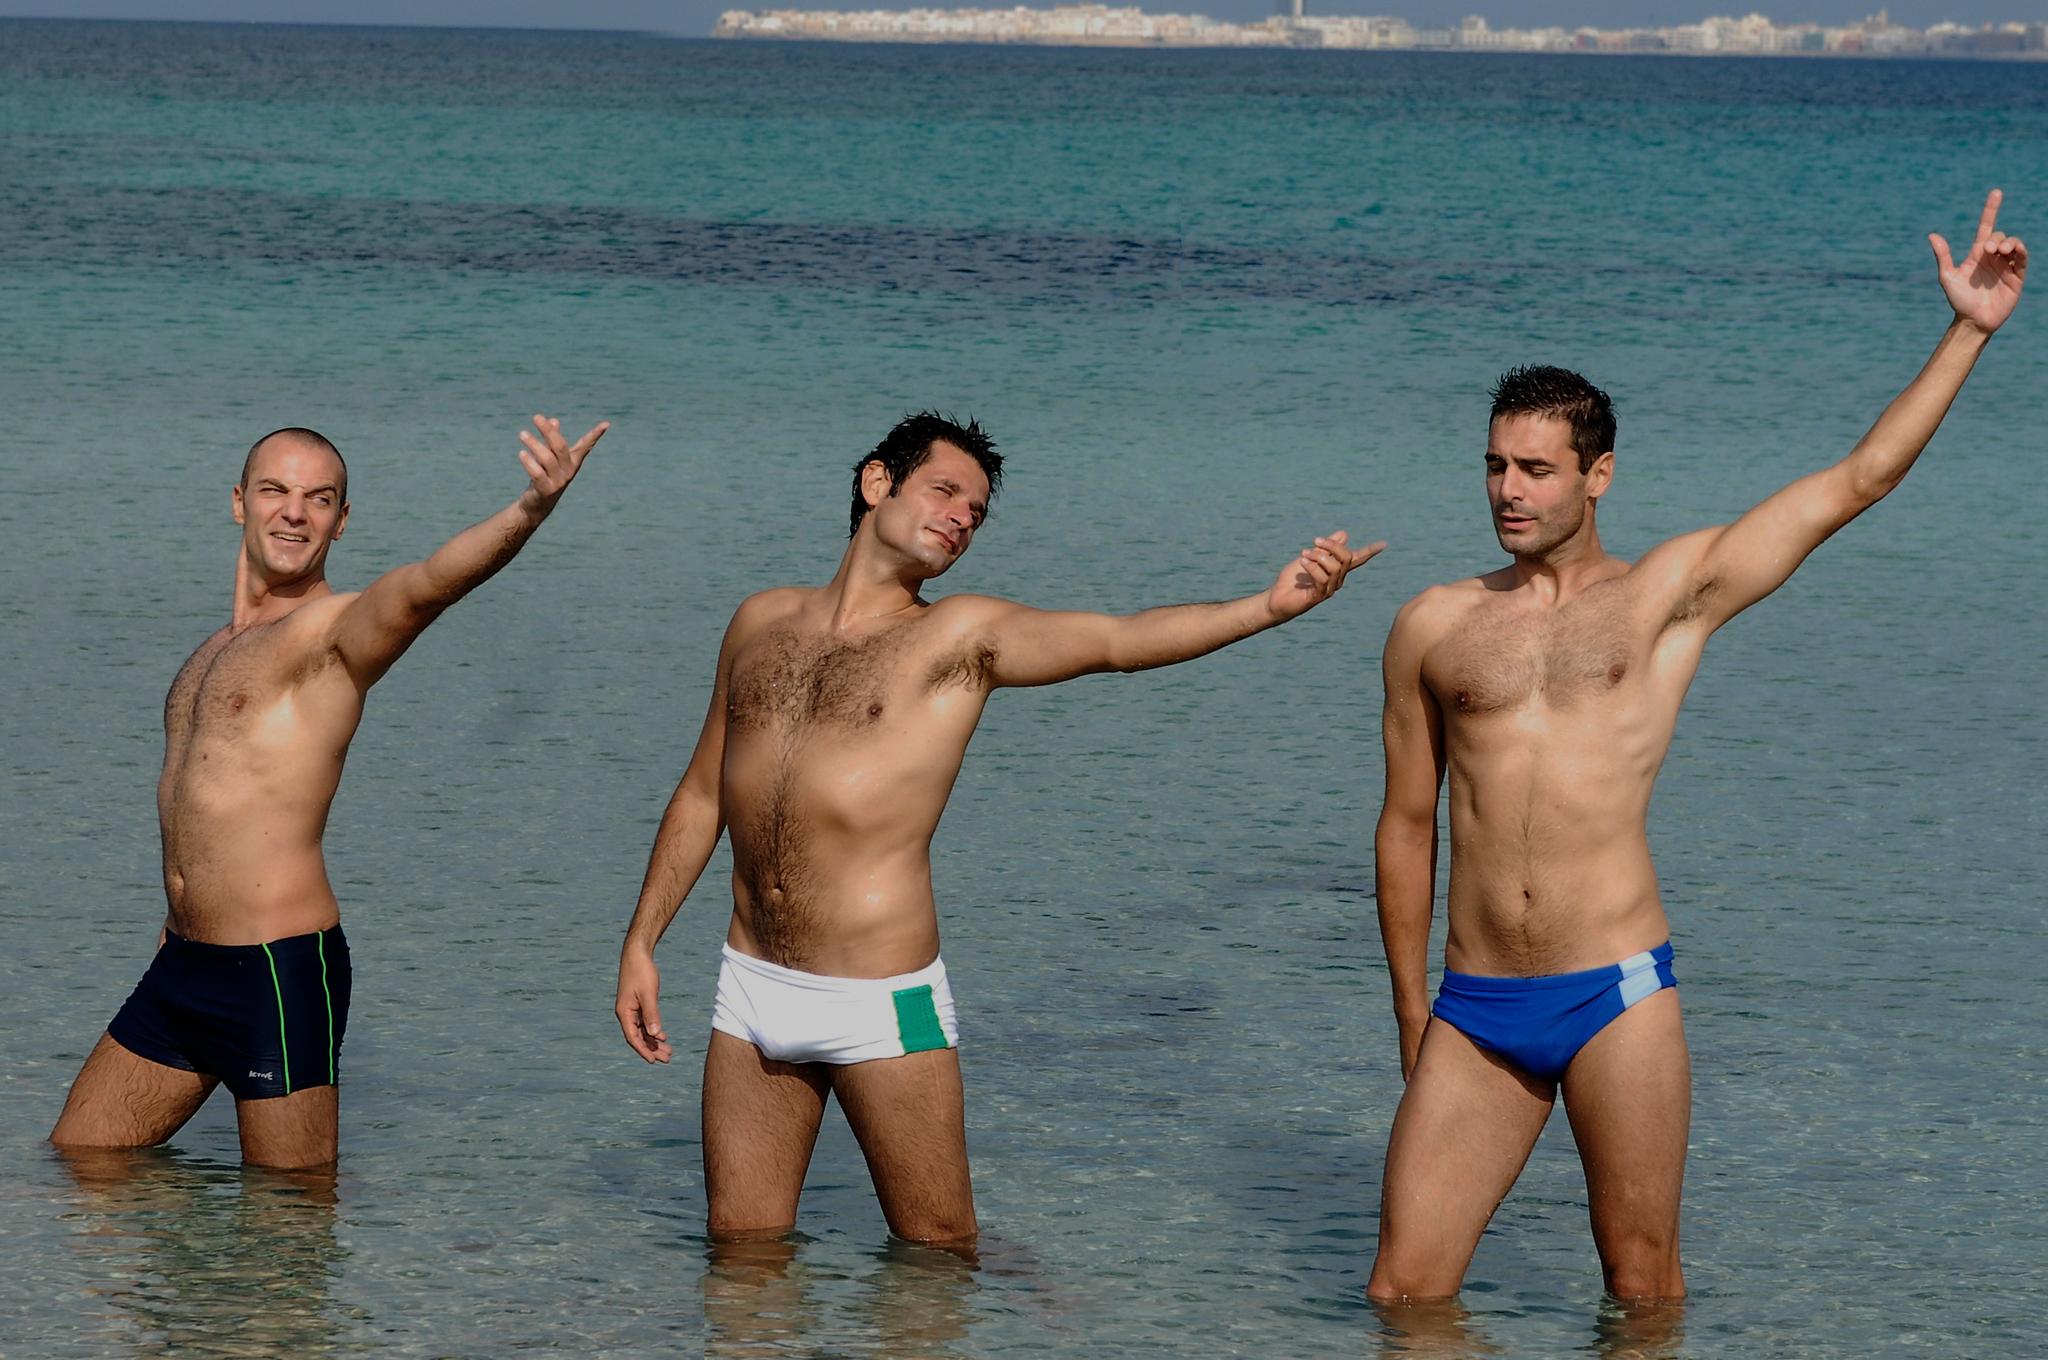 Daniele Pecci, Gianluca De Marchi, and Mauro Bonaffini in Mine vaganti (2010)